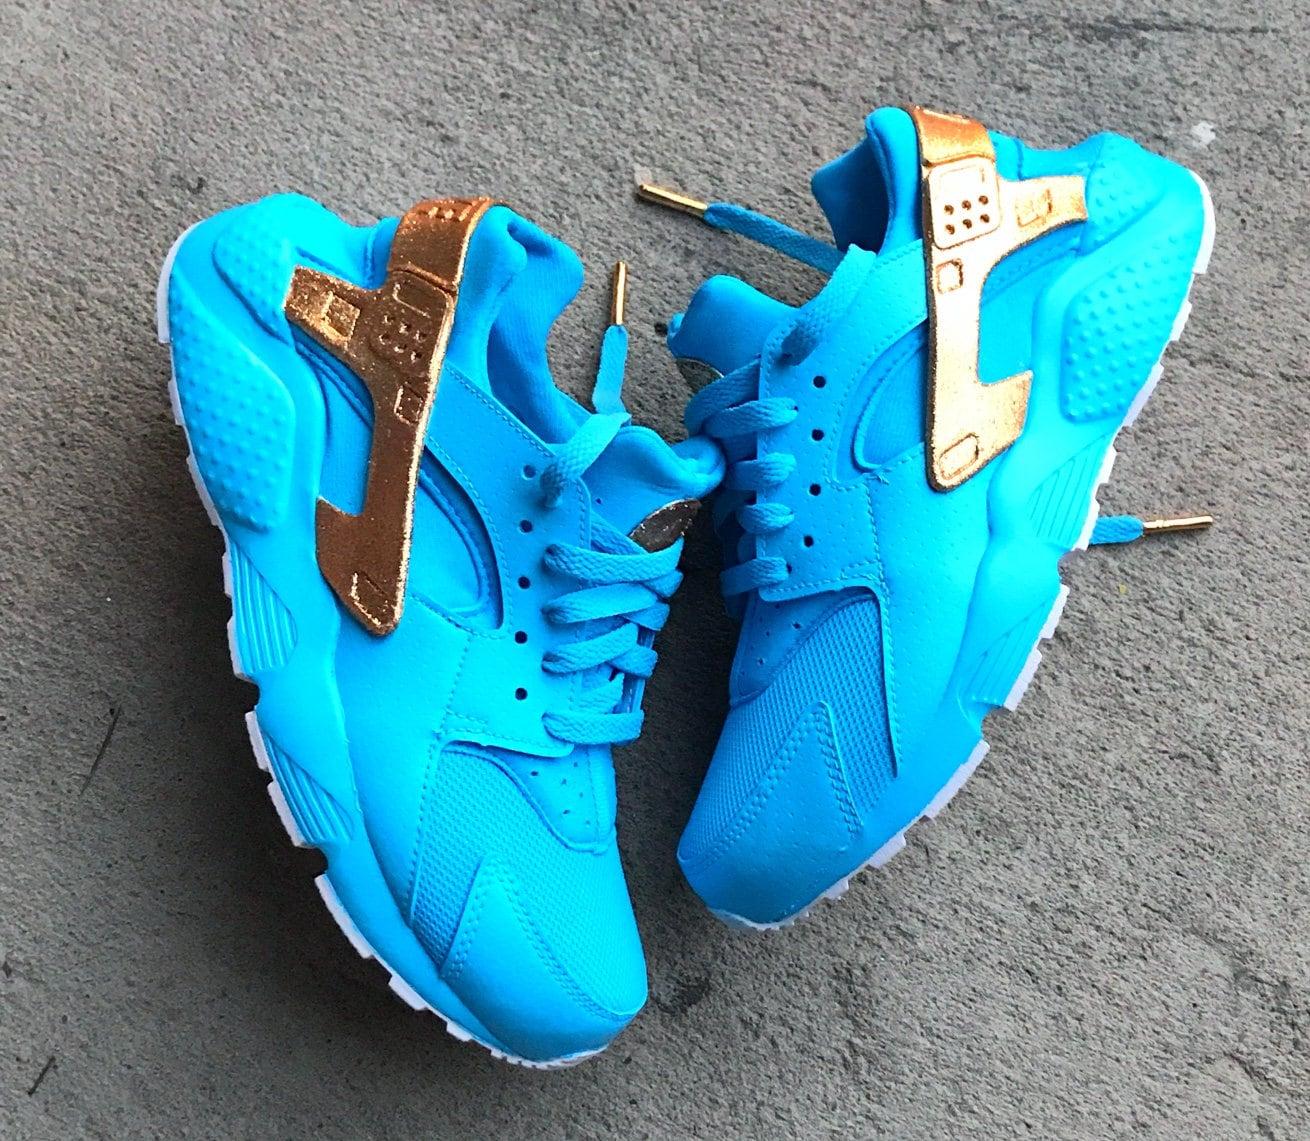 63a22fd7d926b Skyy Blue Nike Huarache Custom. 1